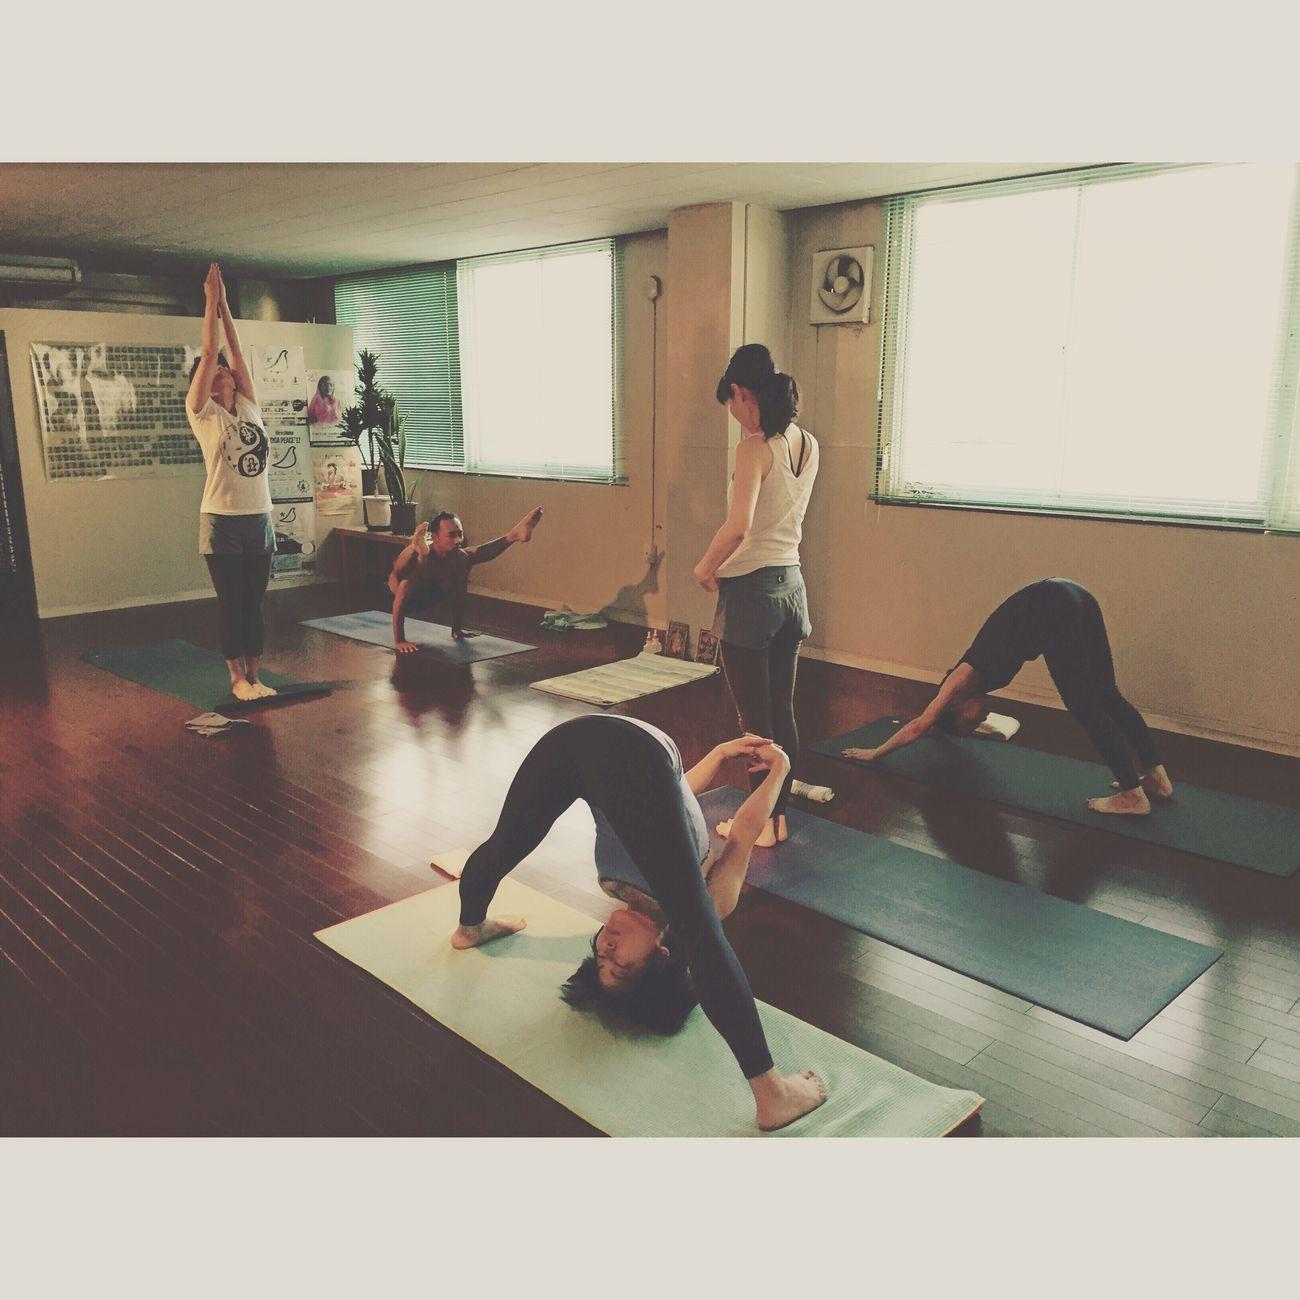 Yoga space Siddhi mysore class Ashtangayoga Yoga Space Siddhi Yoga